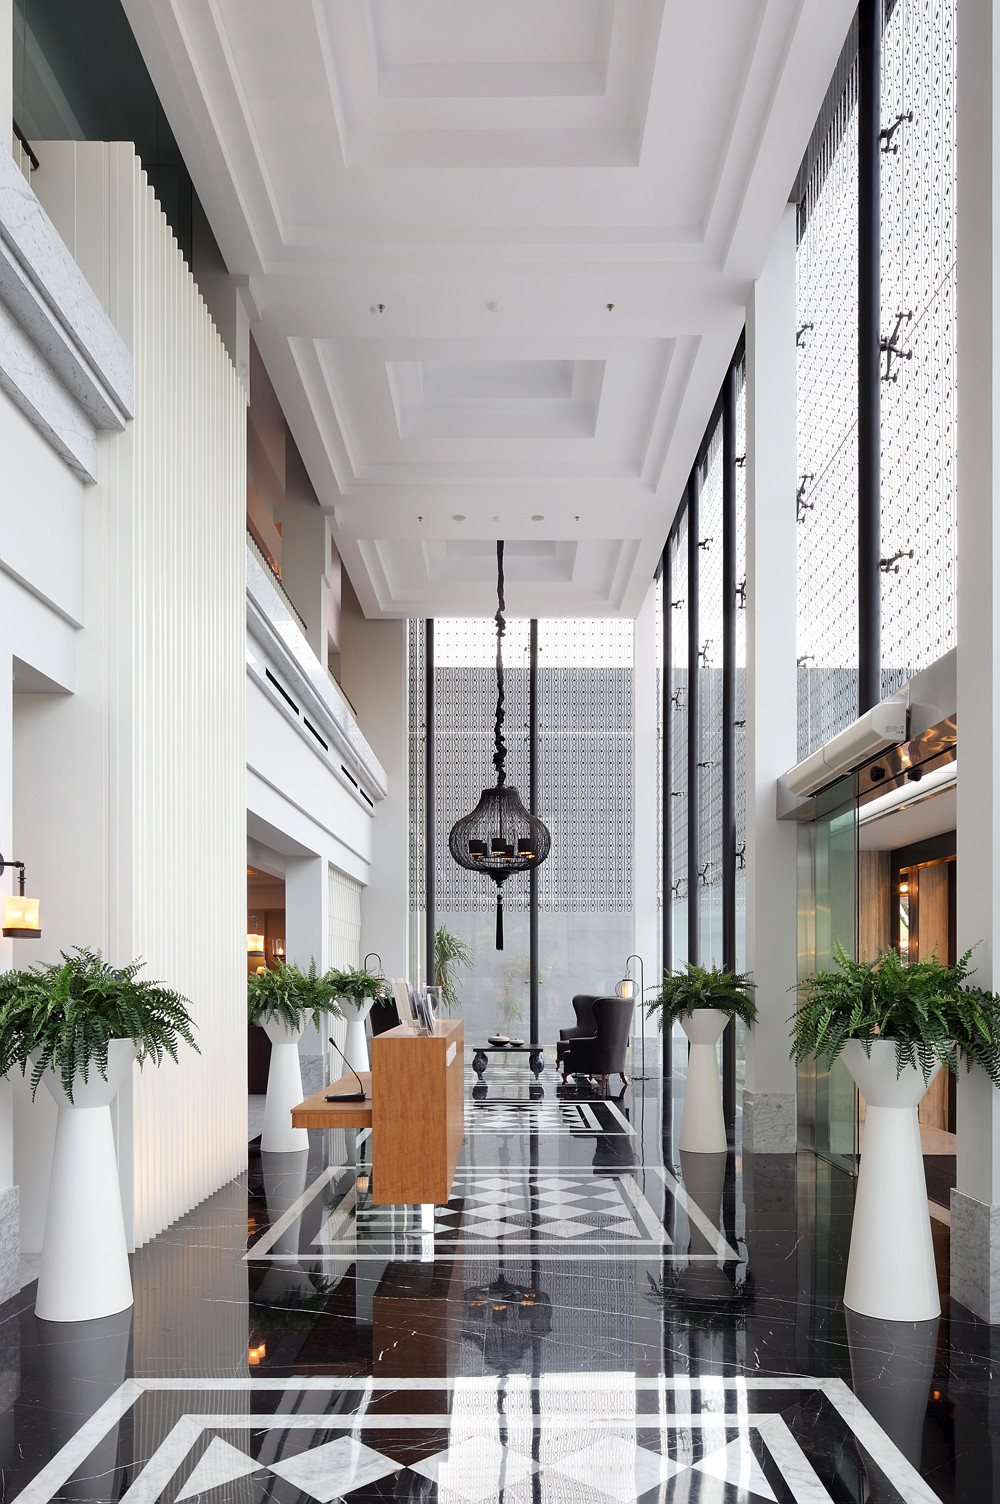 Gallery Of Erha Clinic Surabaya Hmp Architects 12